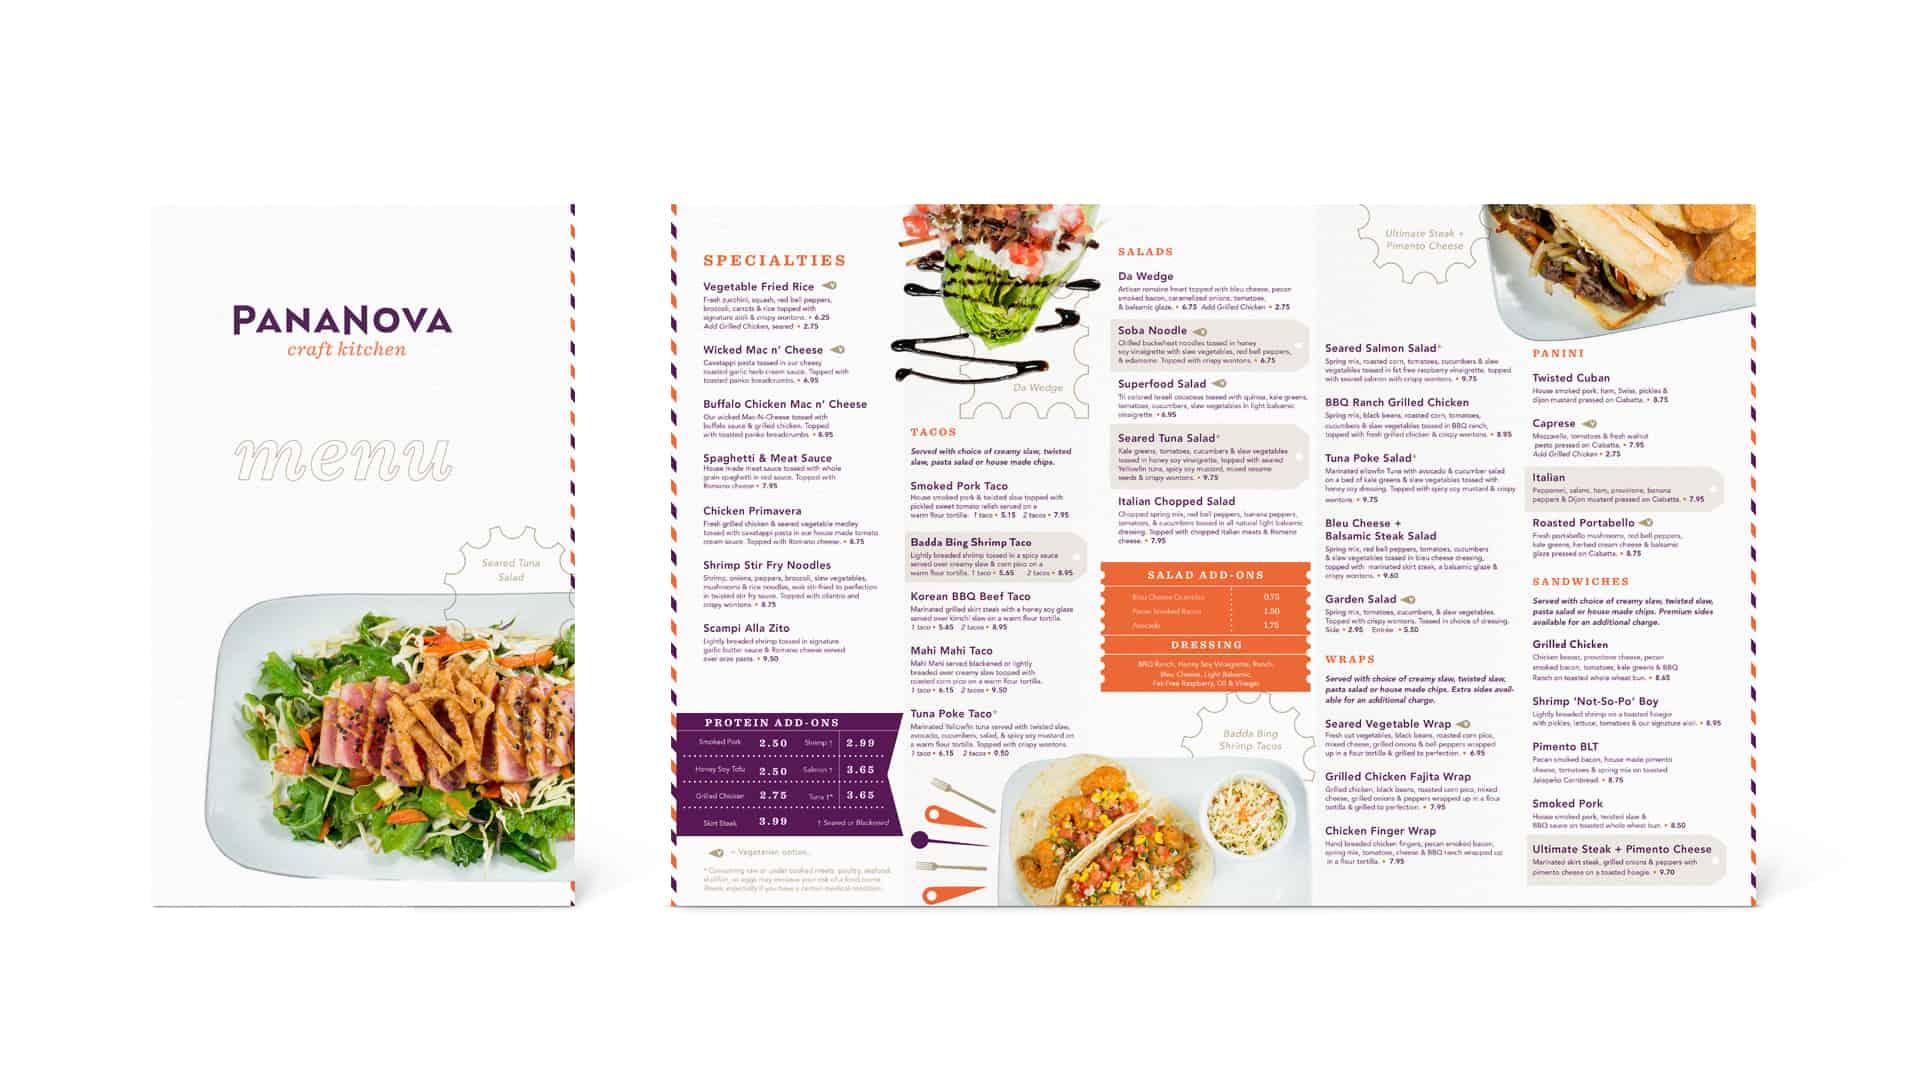 PanaNova fast casual restaurant menu design and menu consulting